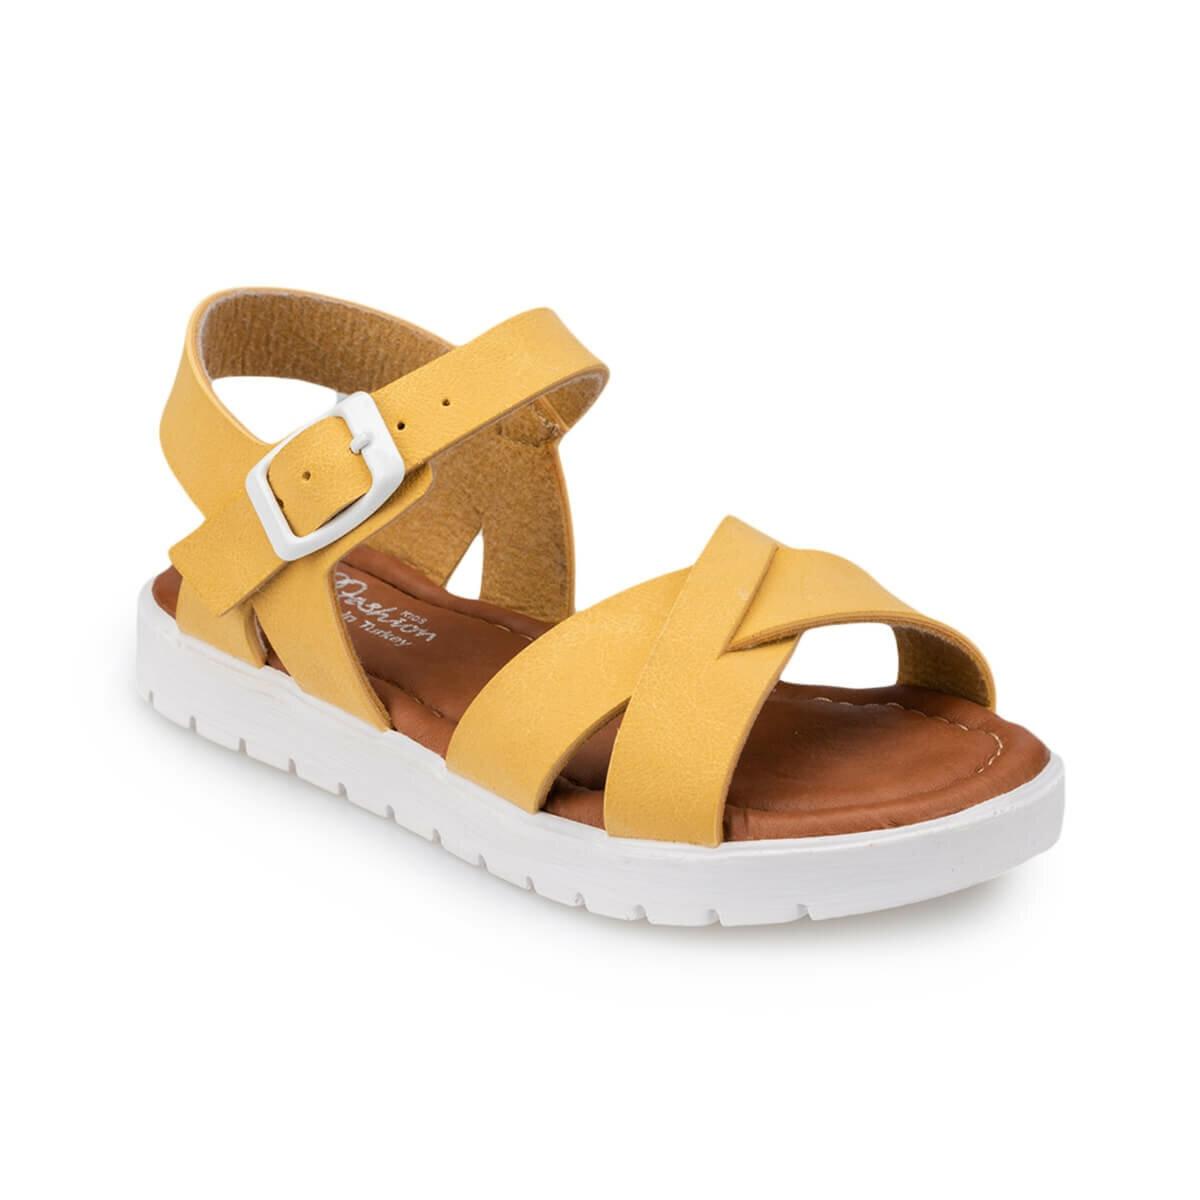 FLO 91.508159.B Yellow Female Child Sandals Polaris